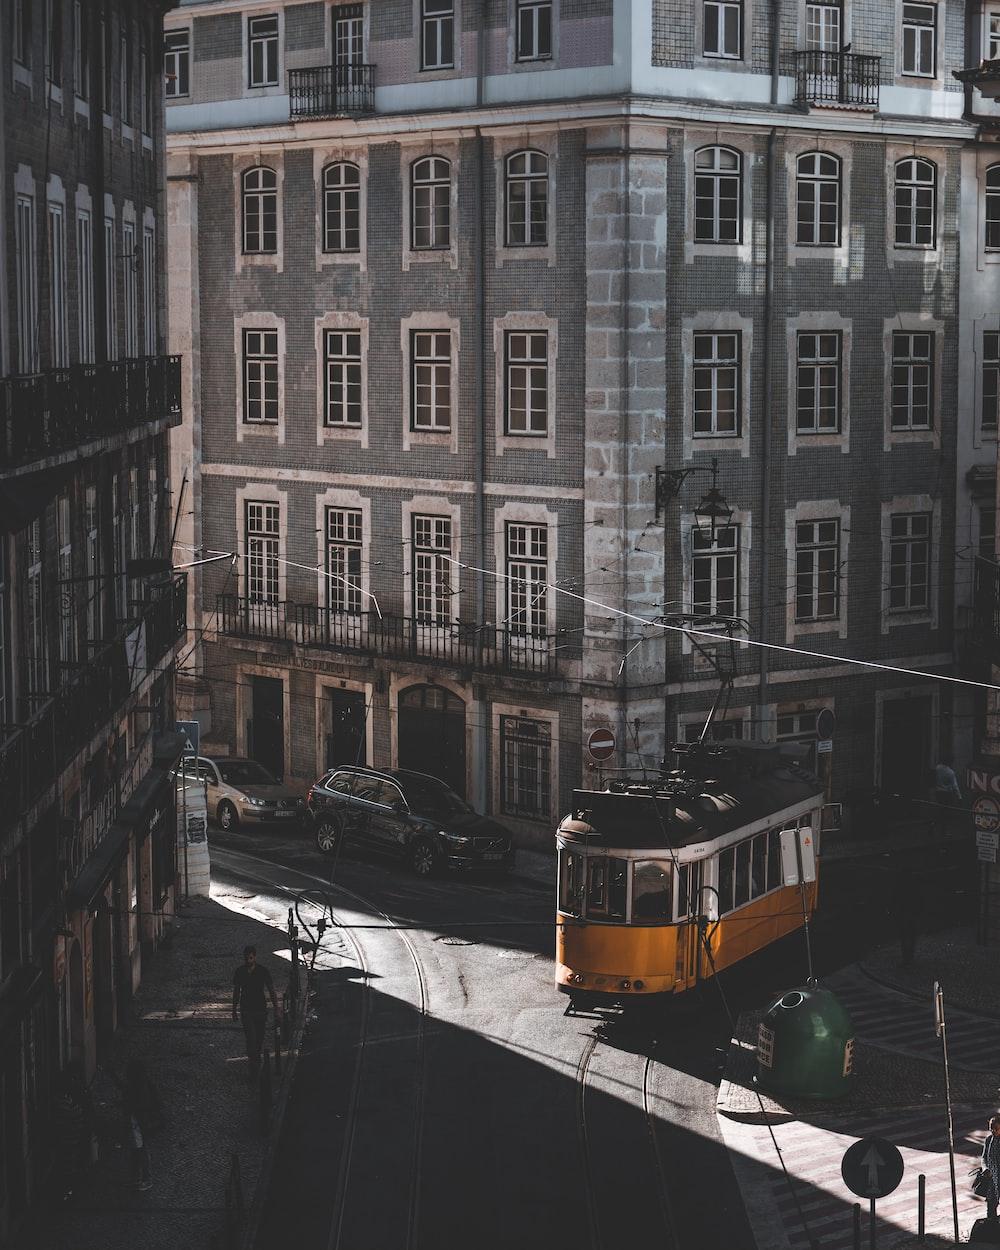 yellow tram roaming on street